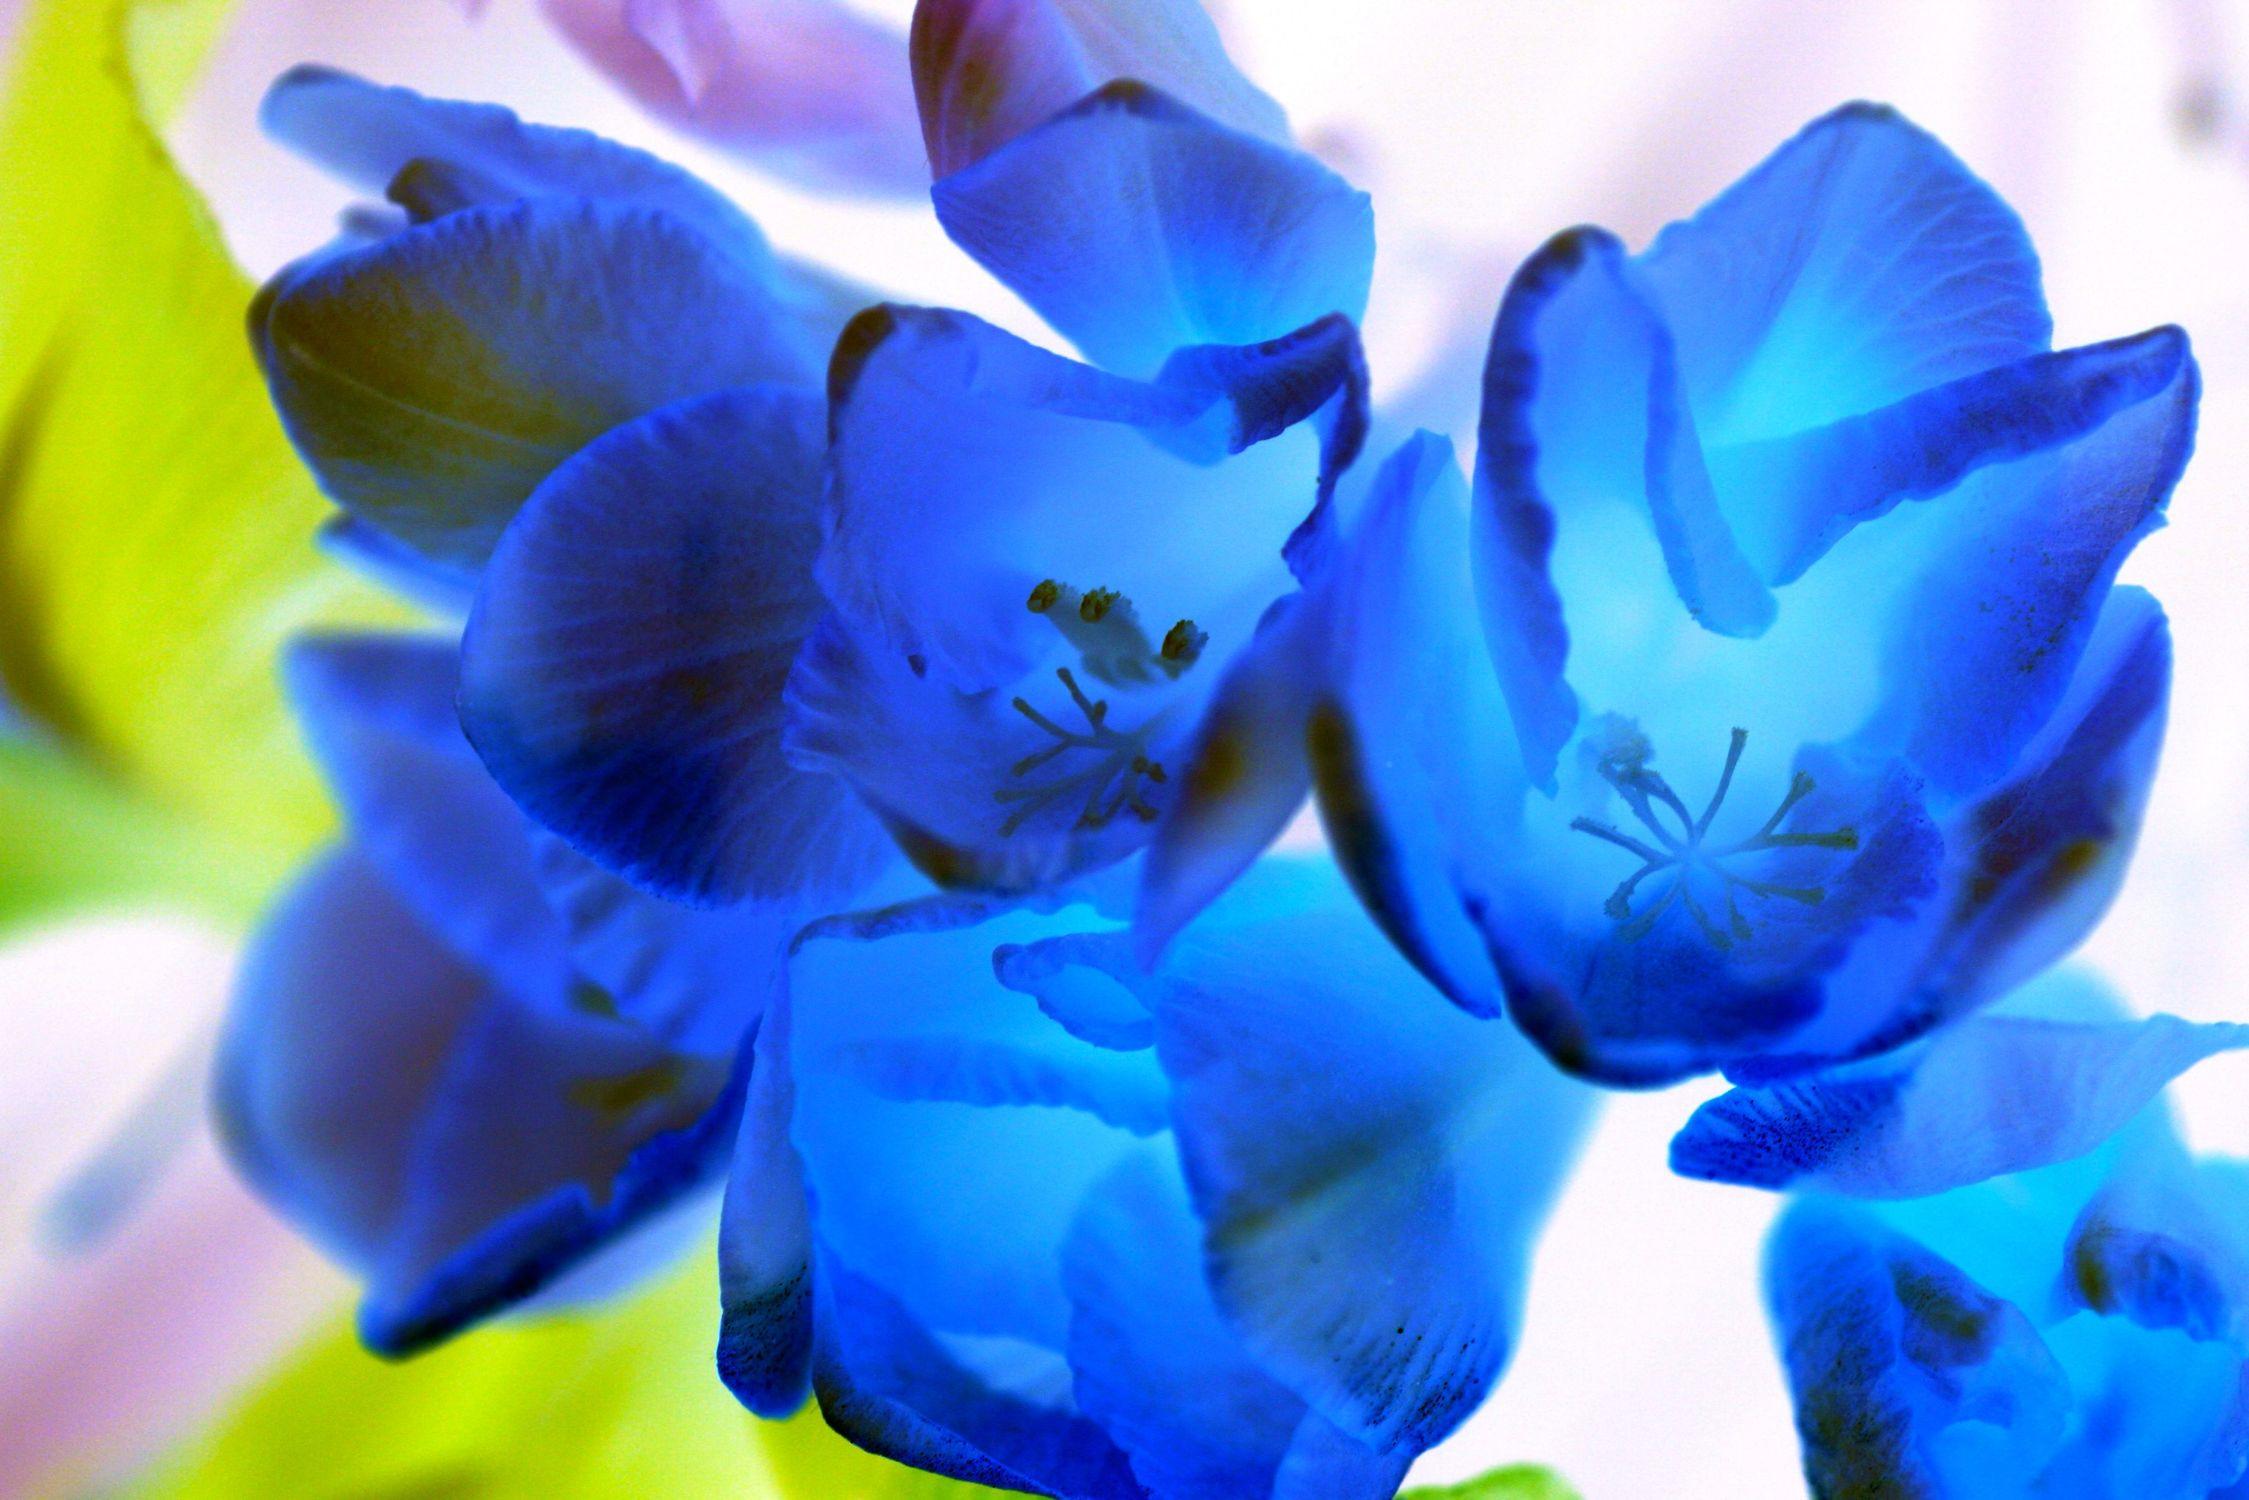 Bild mit Farben, Natur, Pflanzen, Pflanzen, Blumen, Blau, Blume, Pflanze, Tulpe, Tulips, Tulpen, Tulipa, Tulip